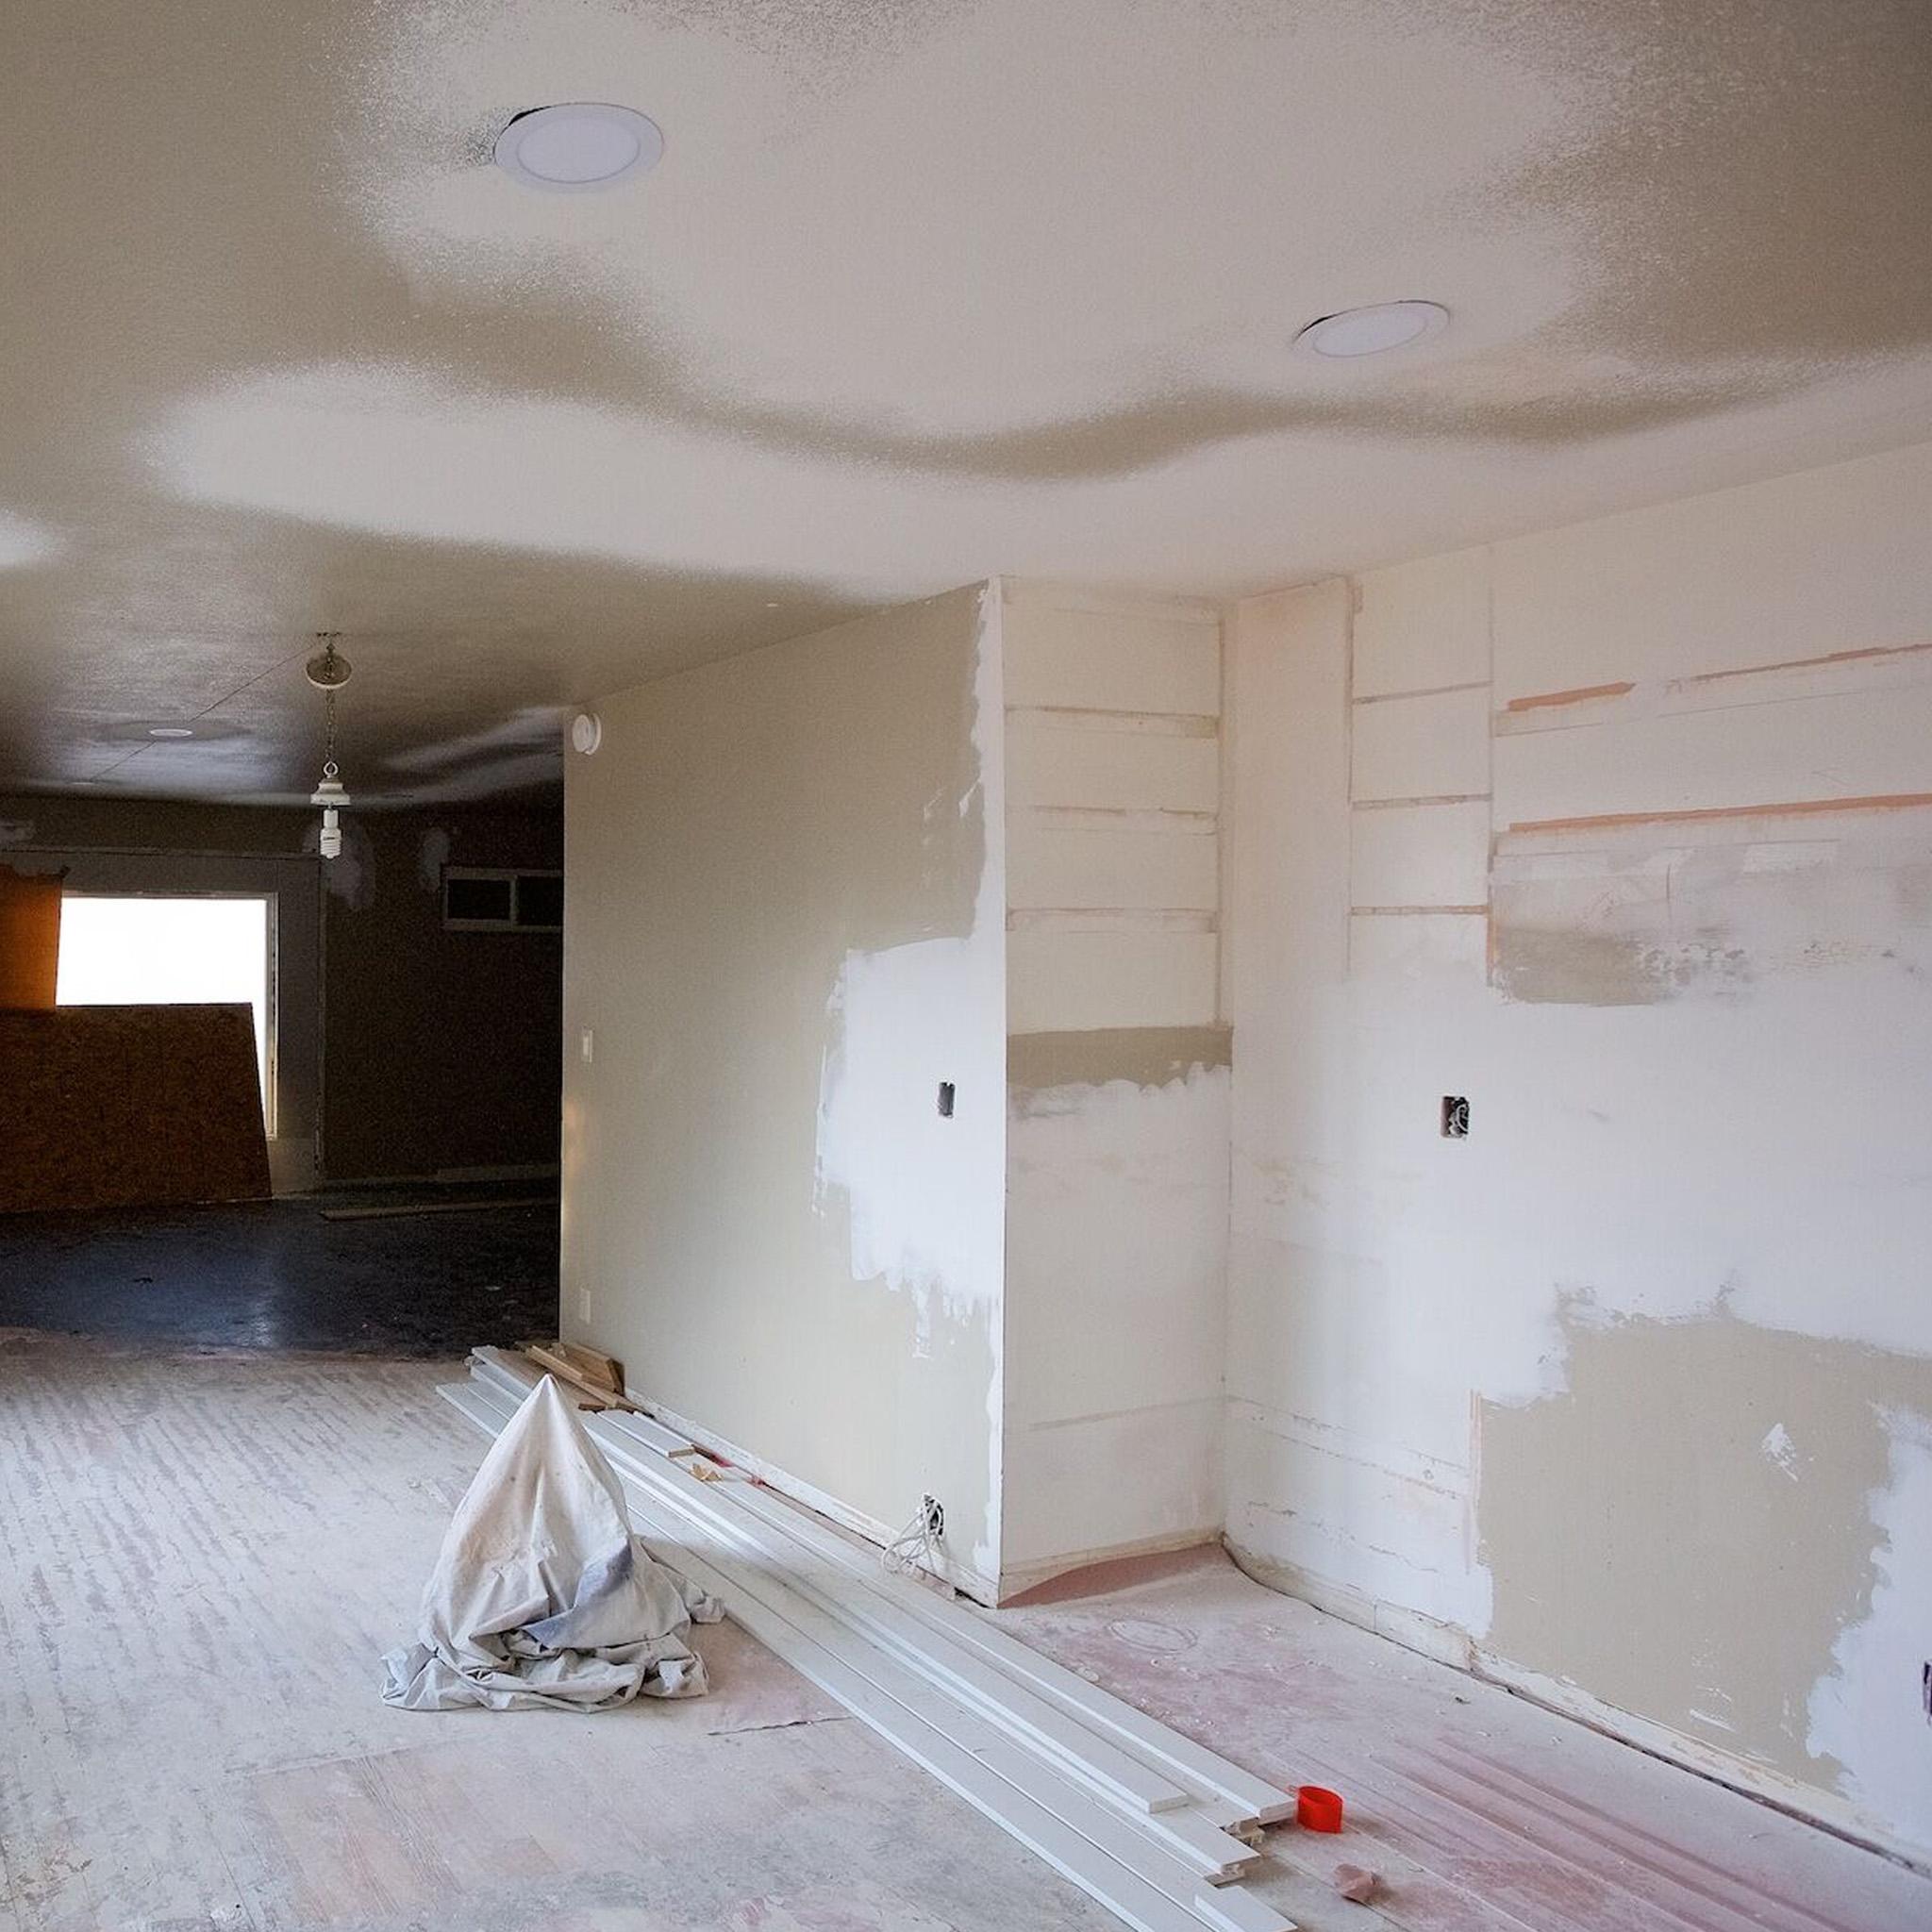 S2E04 - The Mural House_0006_Layer 36.jpg